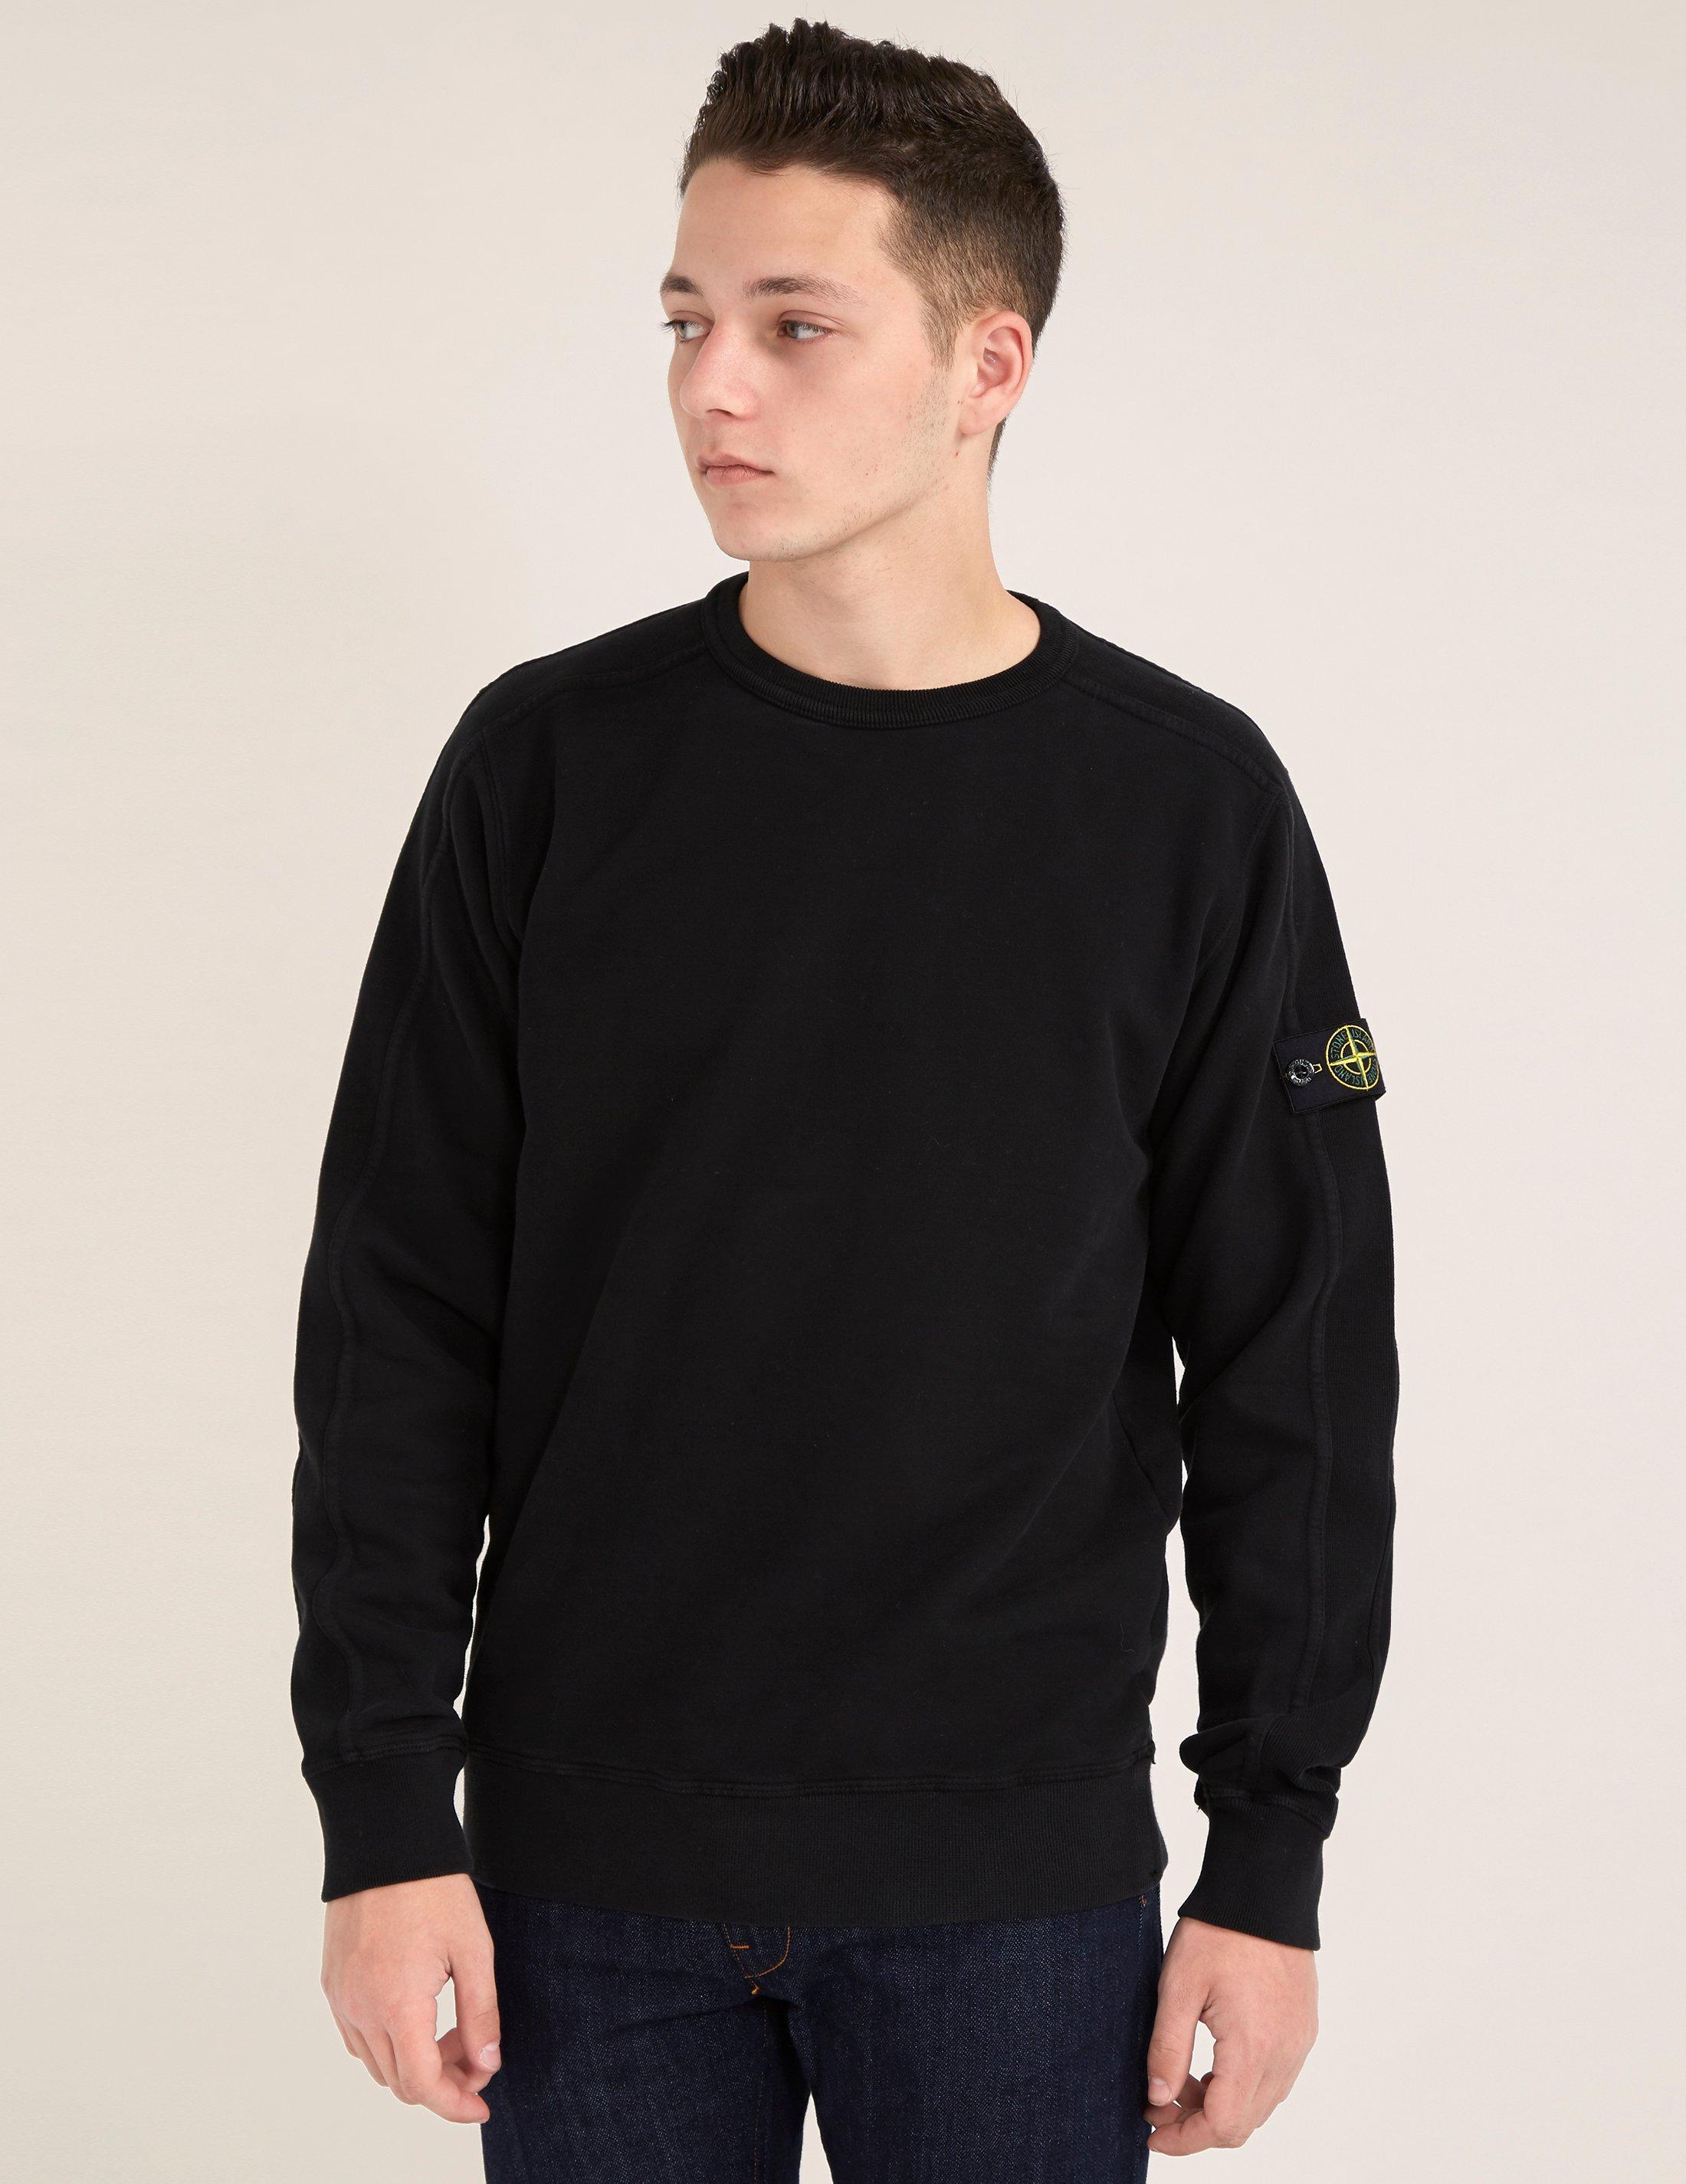 Black stone island shirt